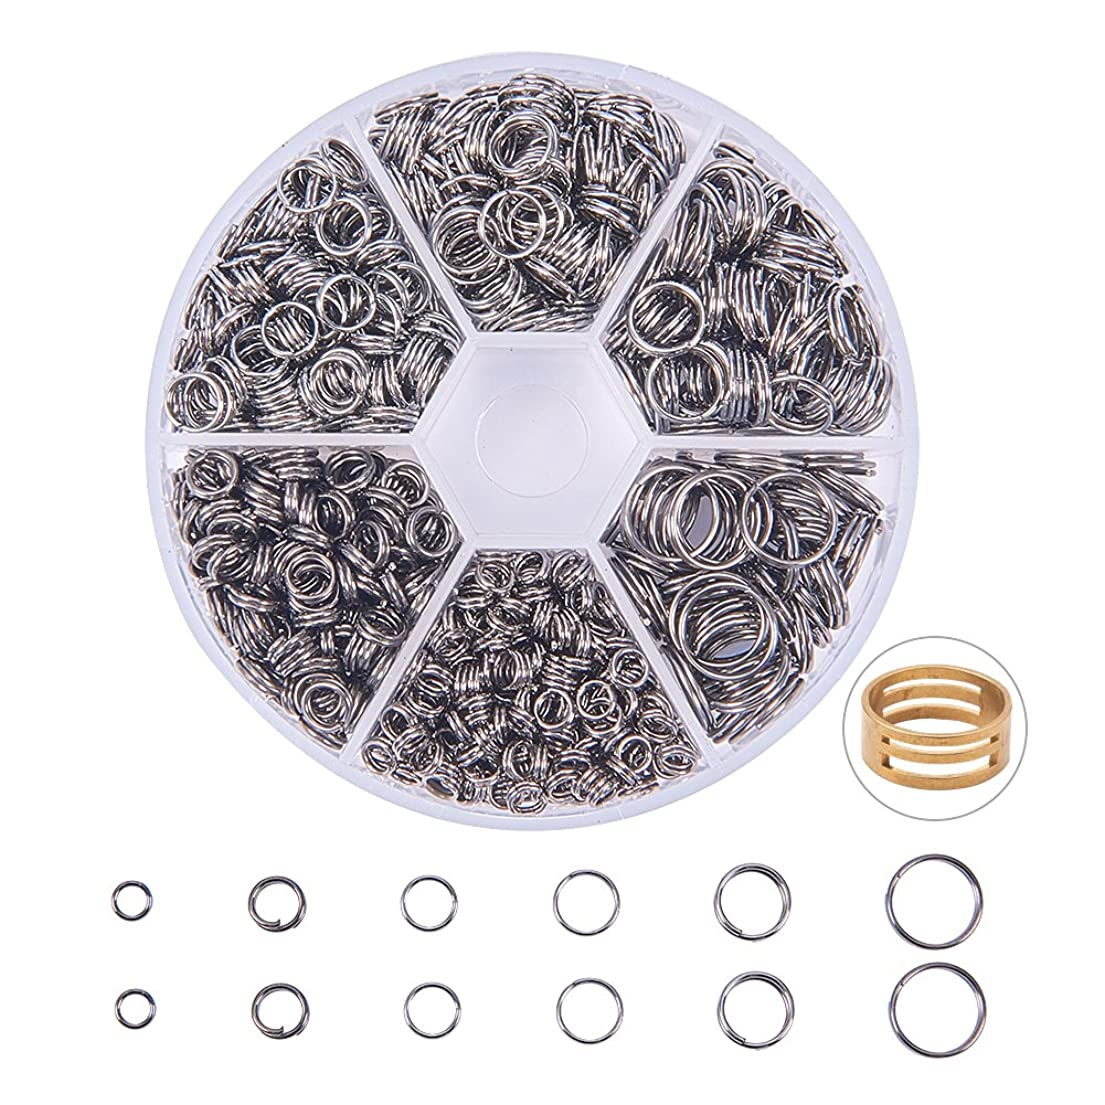 PandaHall Elite 920 Pcs 4/5/6/7/8/10mm Iron Split Rings Double Loop Jump Ring Diameter for Jewelry Making Gunmetal qfofy3010343972